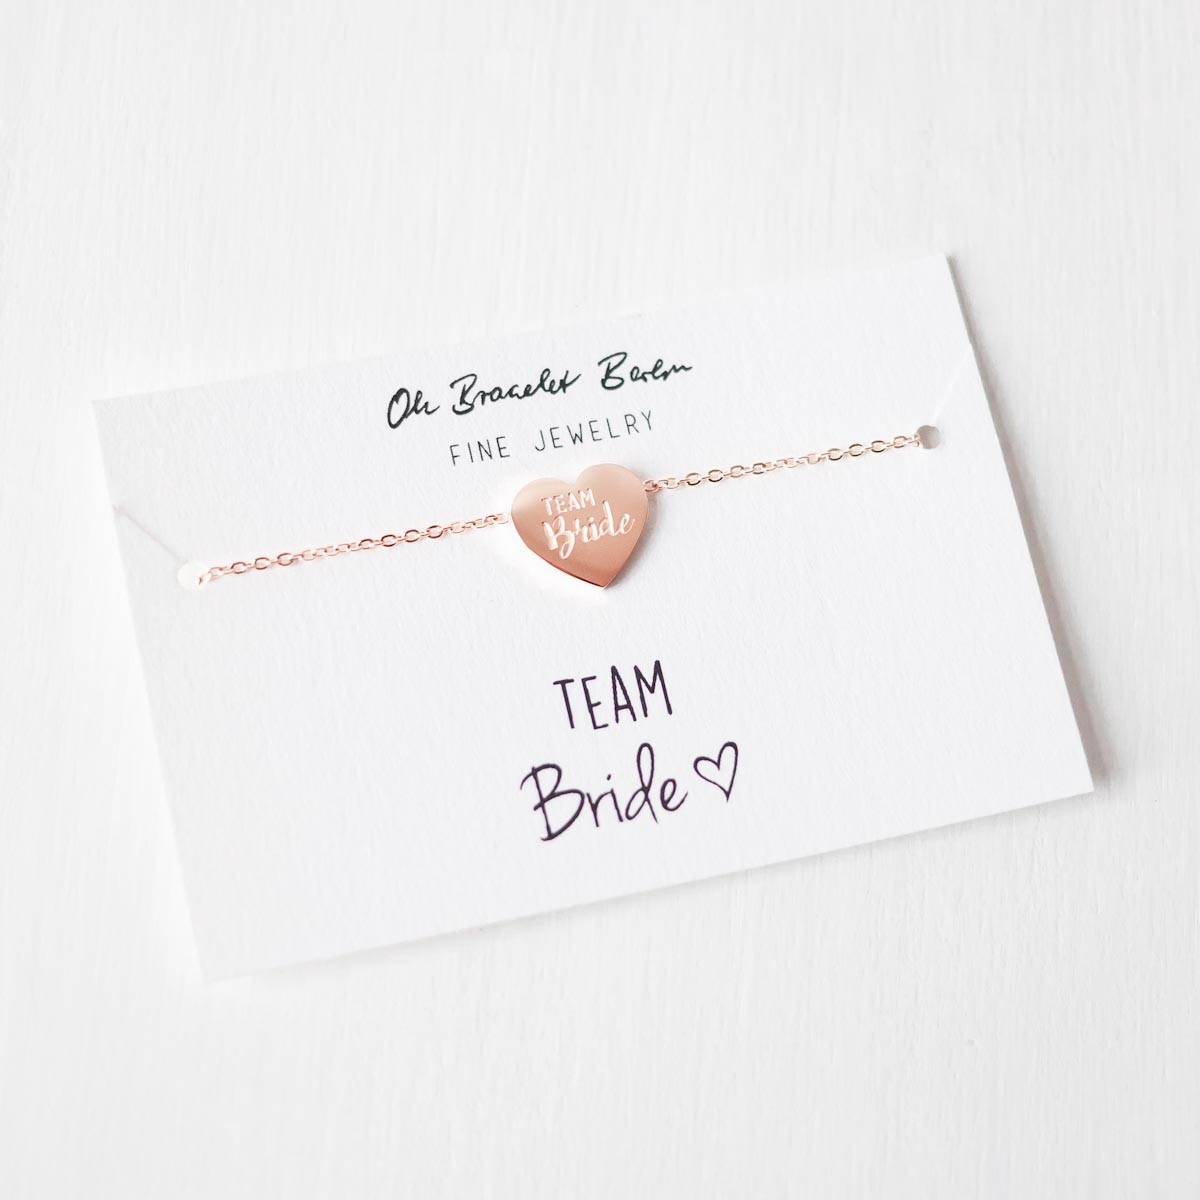 Team Bride Armband II aus Edelstahl, vergoldet